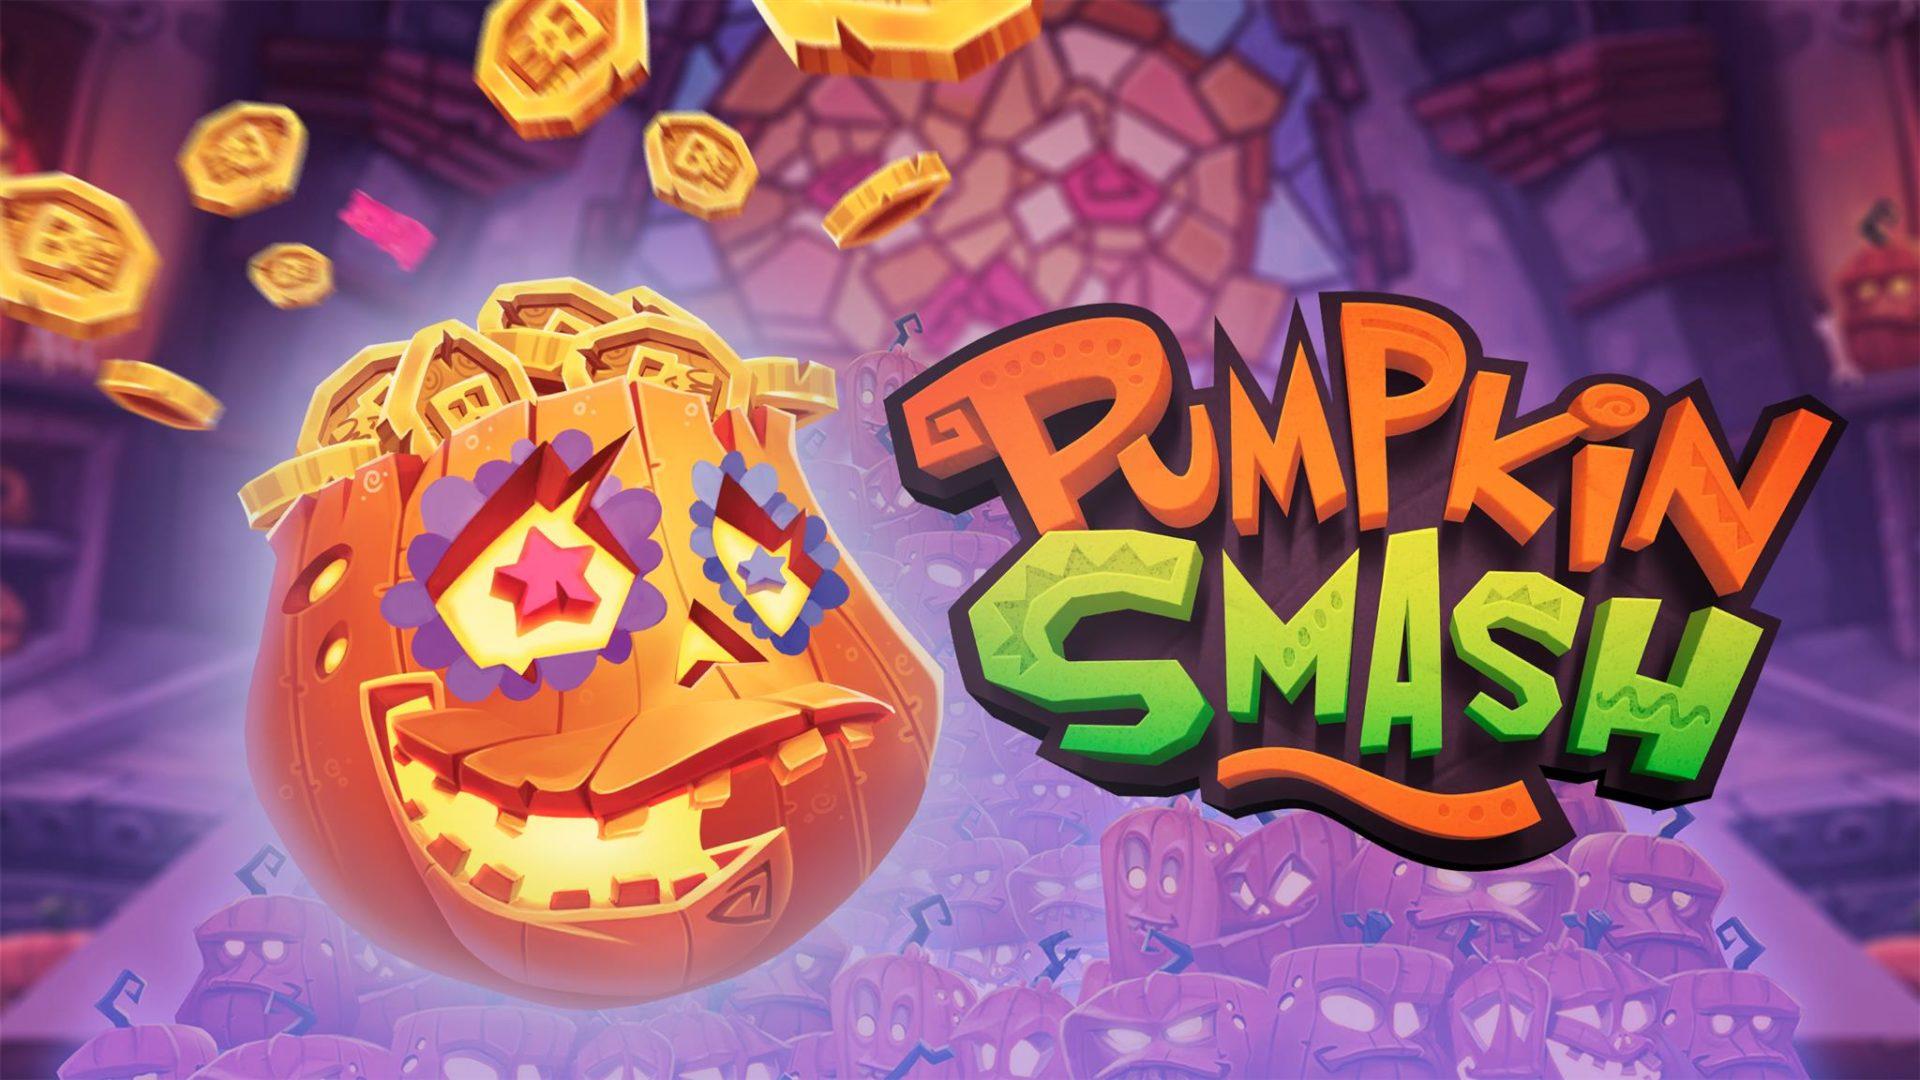 https://playfortuna-2019.pro/wp-content/uploads/2017/12/pumpkin-smash-slots-150x150.jpg